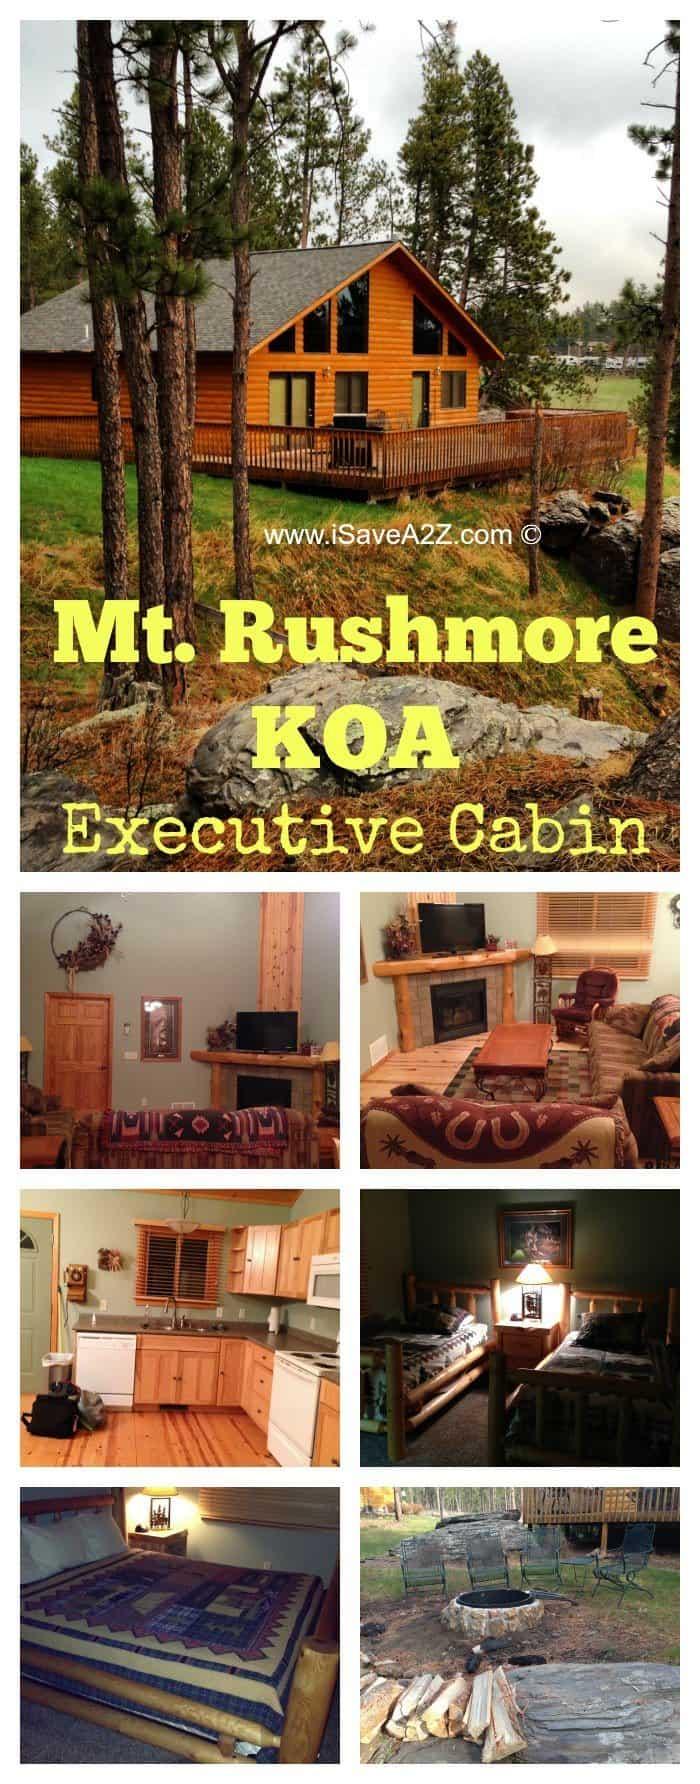 Mt Rushmore KOA Executive Cabins